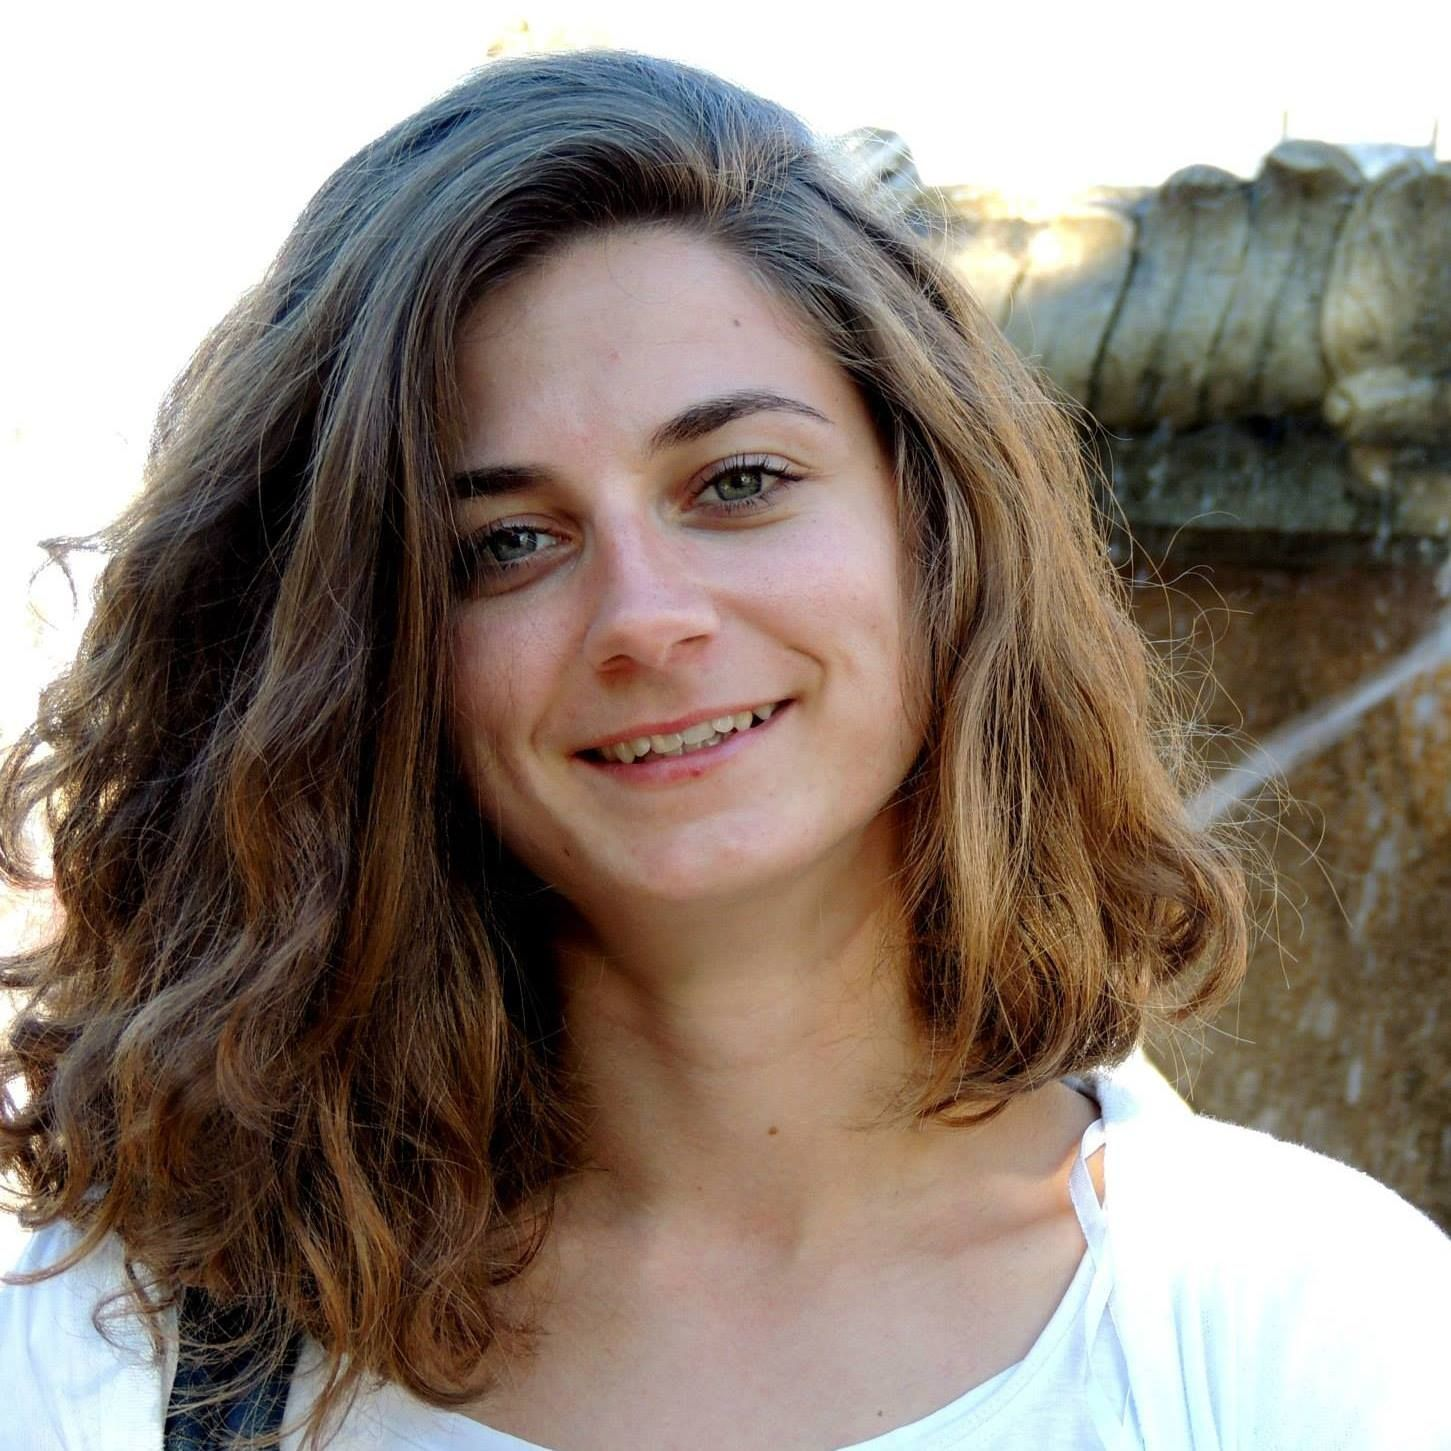 Andelija Sandic